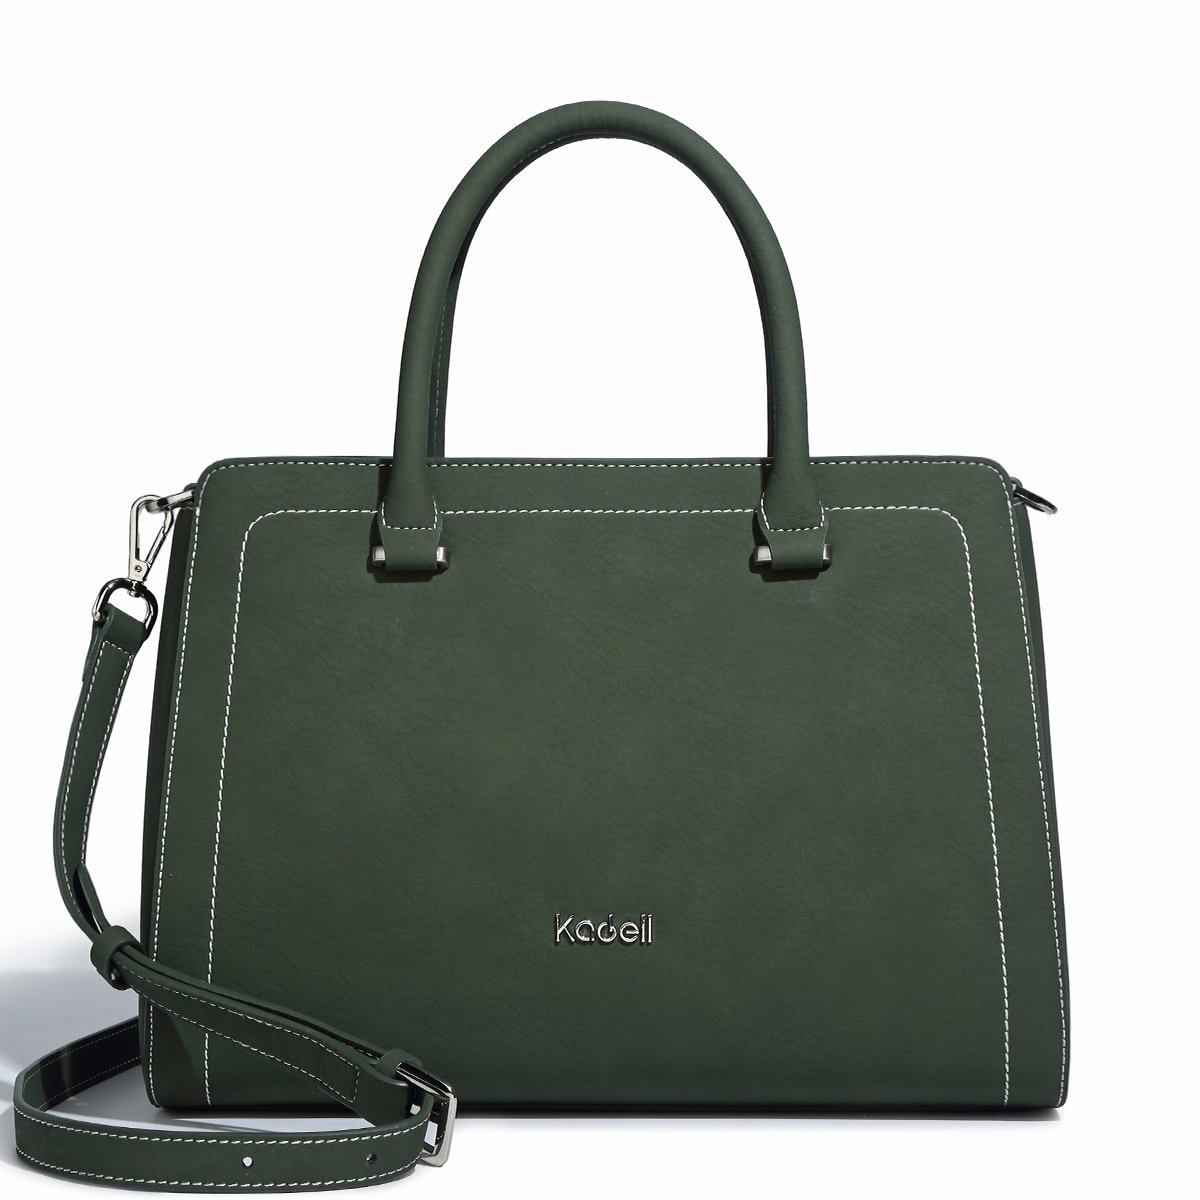 Kadell Women Soft Top Handle Satchel Handbags Shoulder Bag Tote Purse Messenger Bags KADELLHelresk85